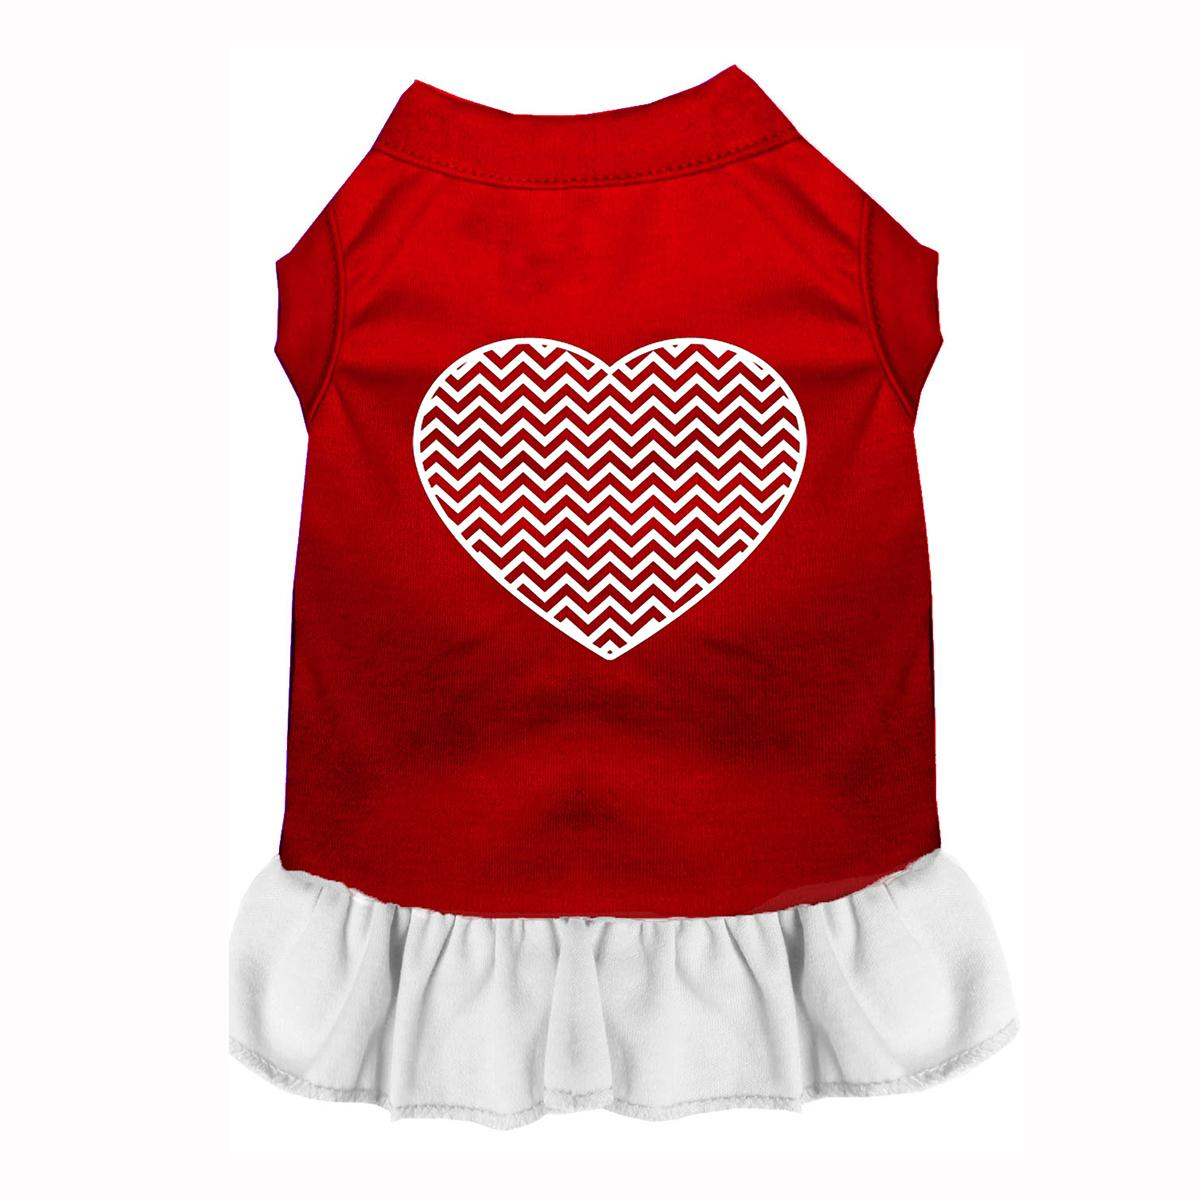 Chevron Heart Screenprint Dog Dress - Red with a White Skirt